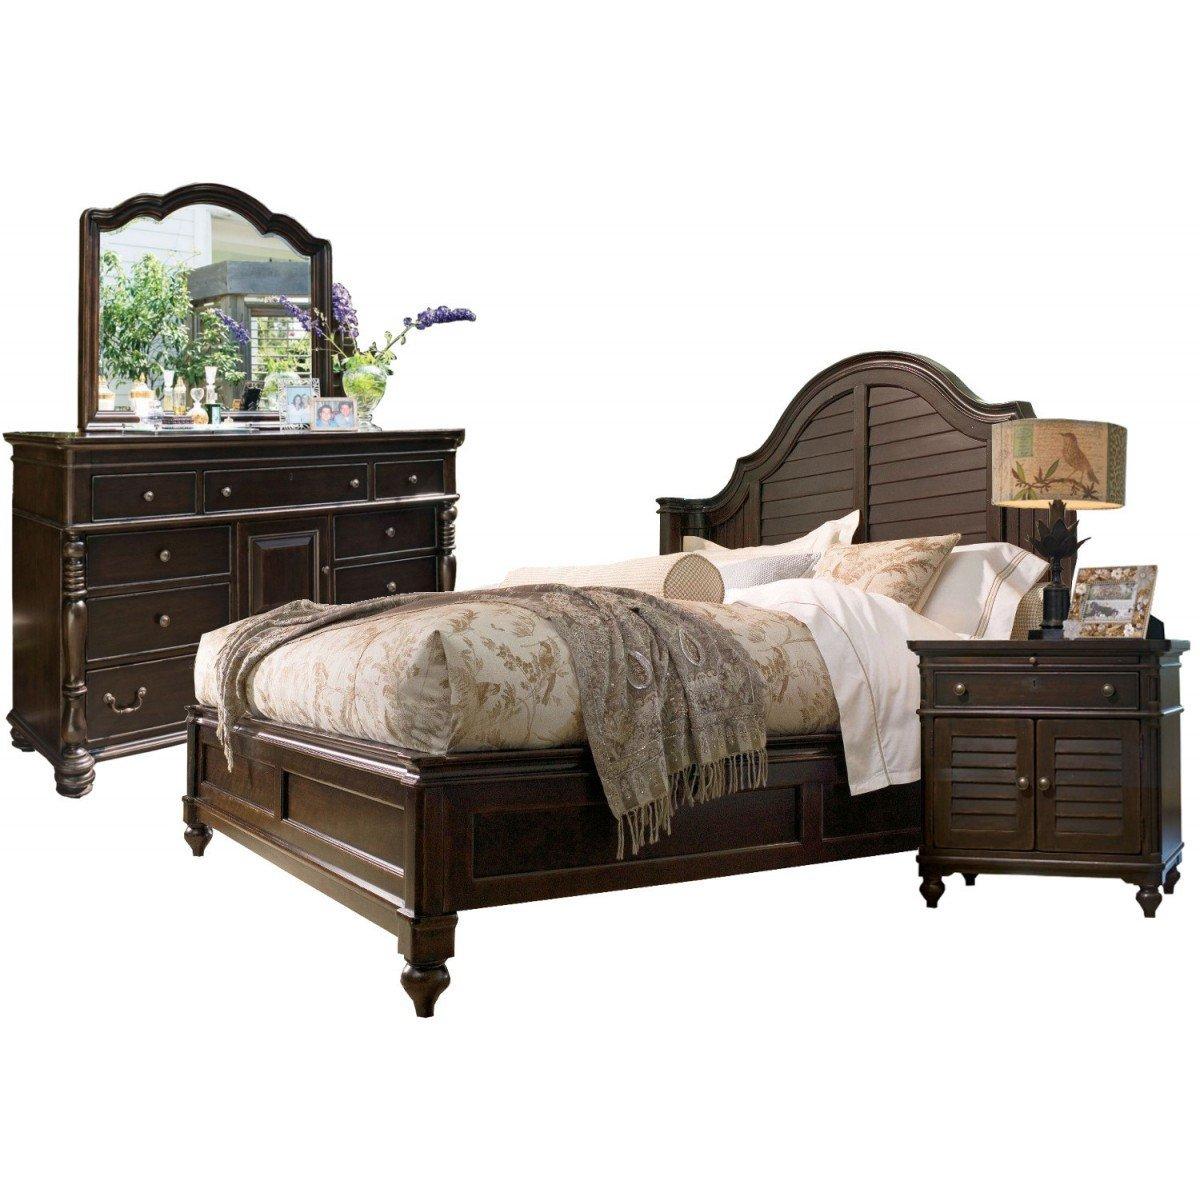 Paula Deen Steel Magnolia Bedroom Set Inspirational Paula Deen Home Steel Magnolia Bedroom Set In tobacco King